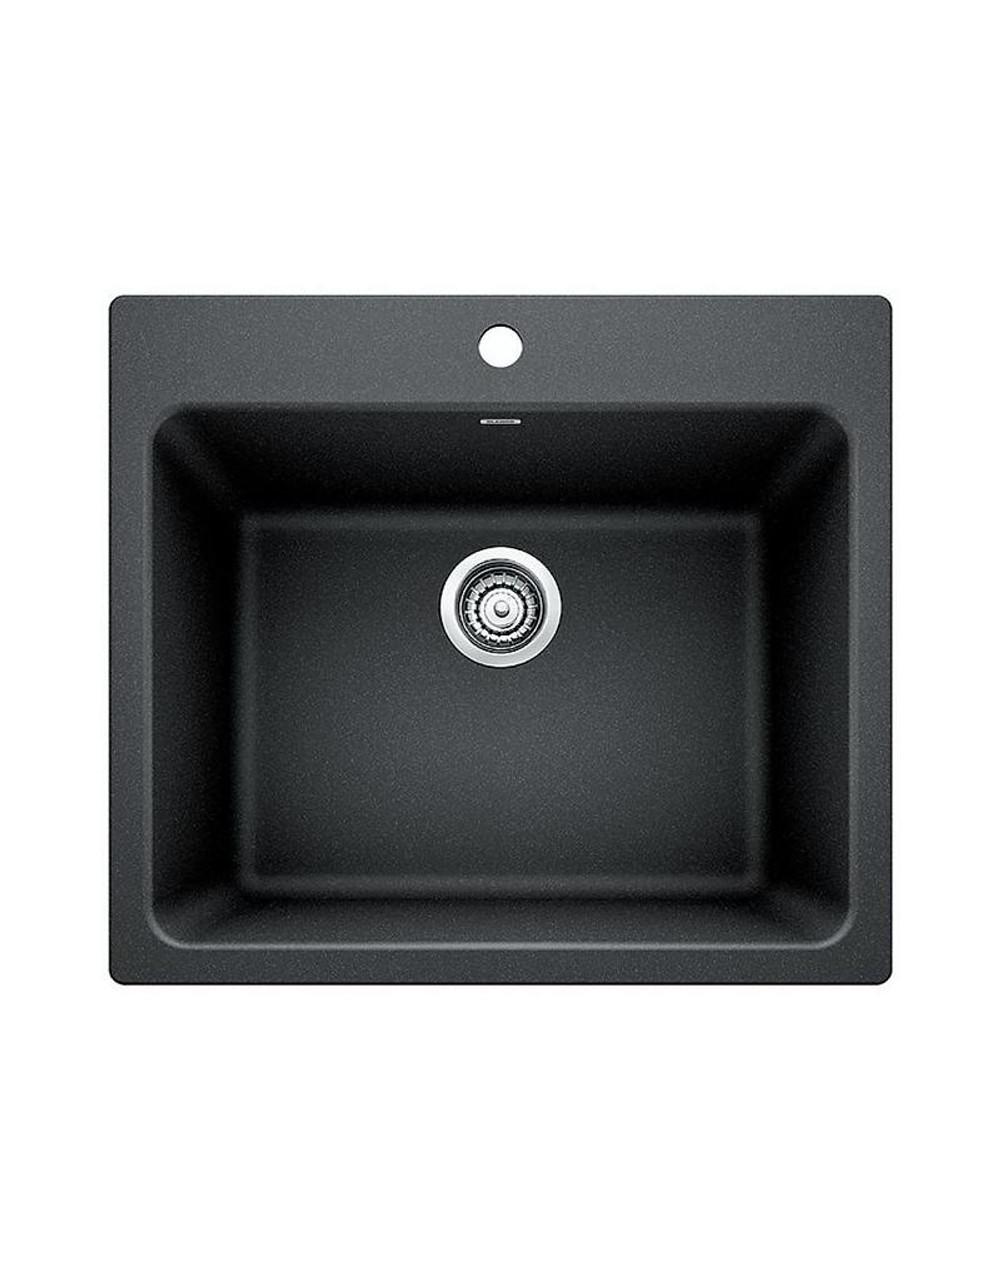 Blanco 401902 Liven Silgranite Laundry Sink York Taps